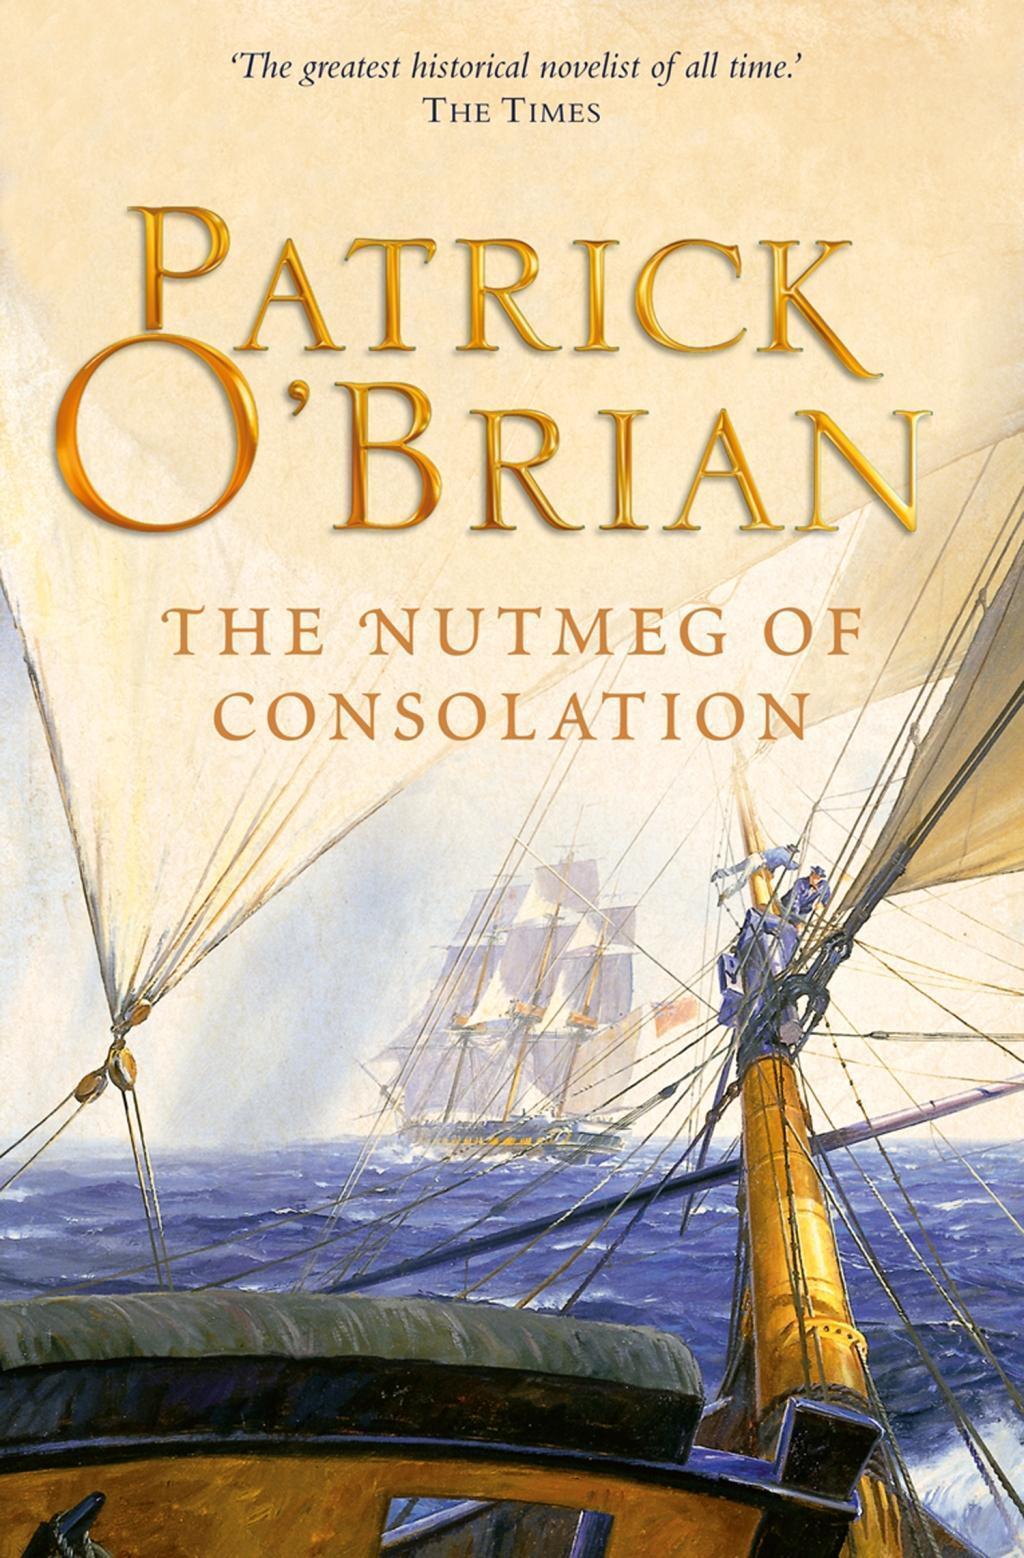 The Nutmeg of Consolation: Aubrey/Maturin series, book 14